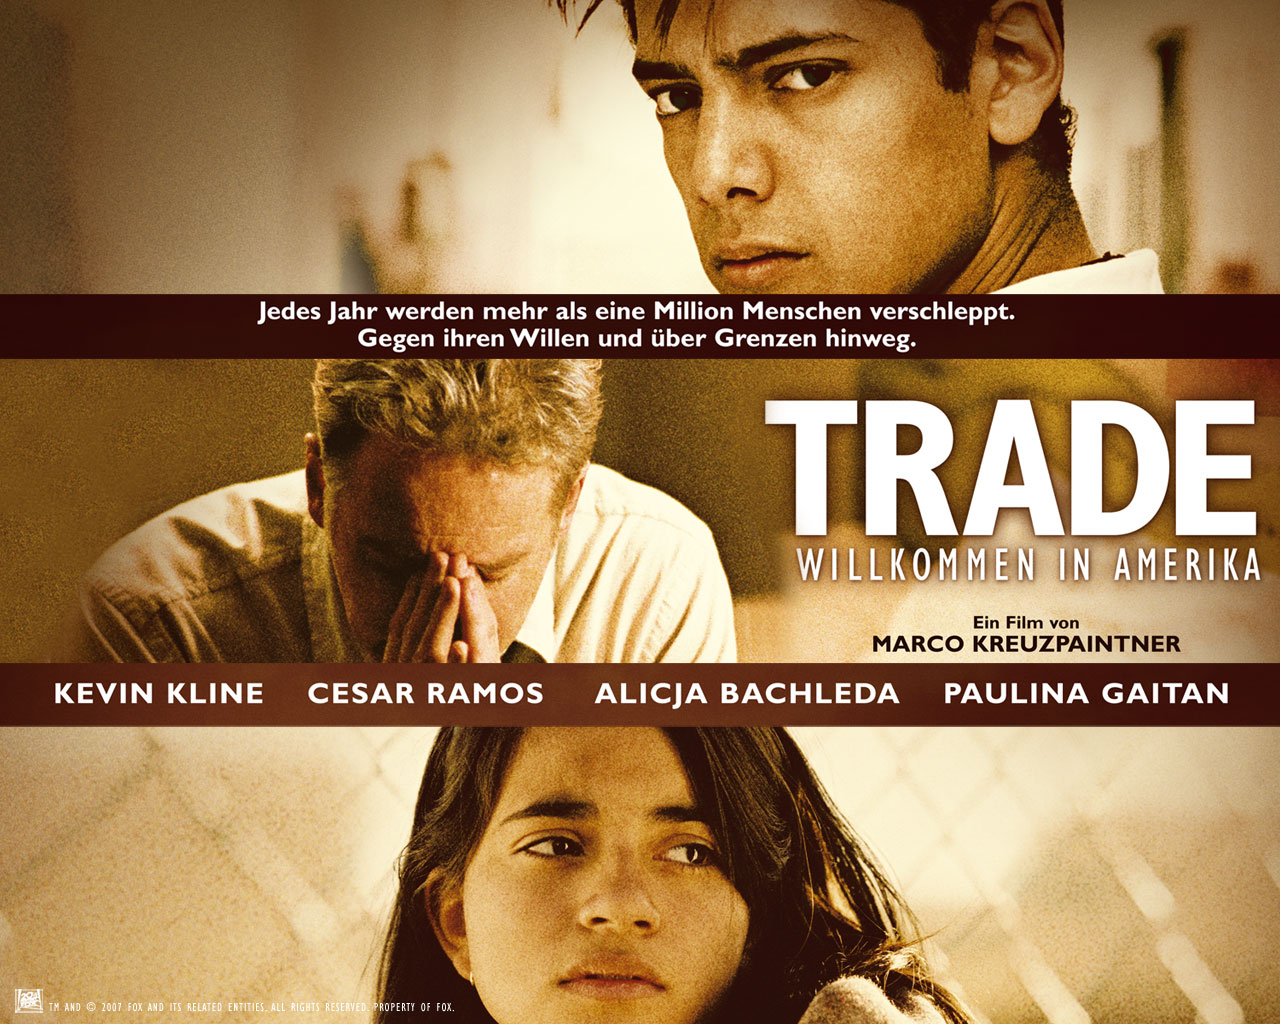 trade sex trafficking movie in Crawley